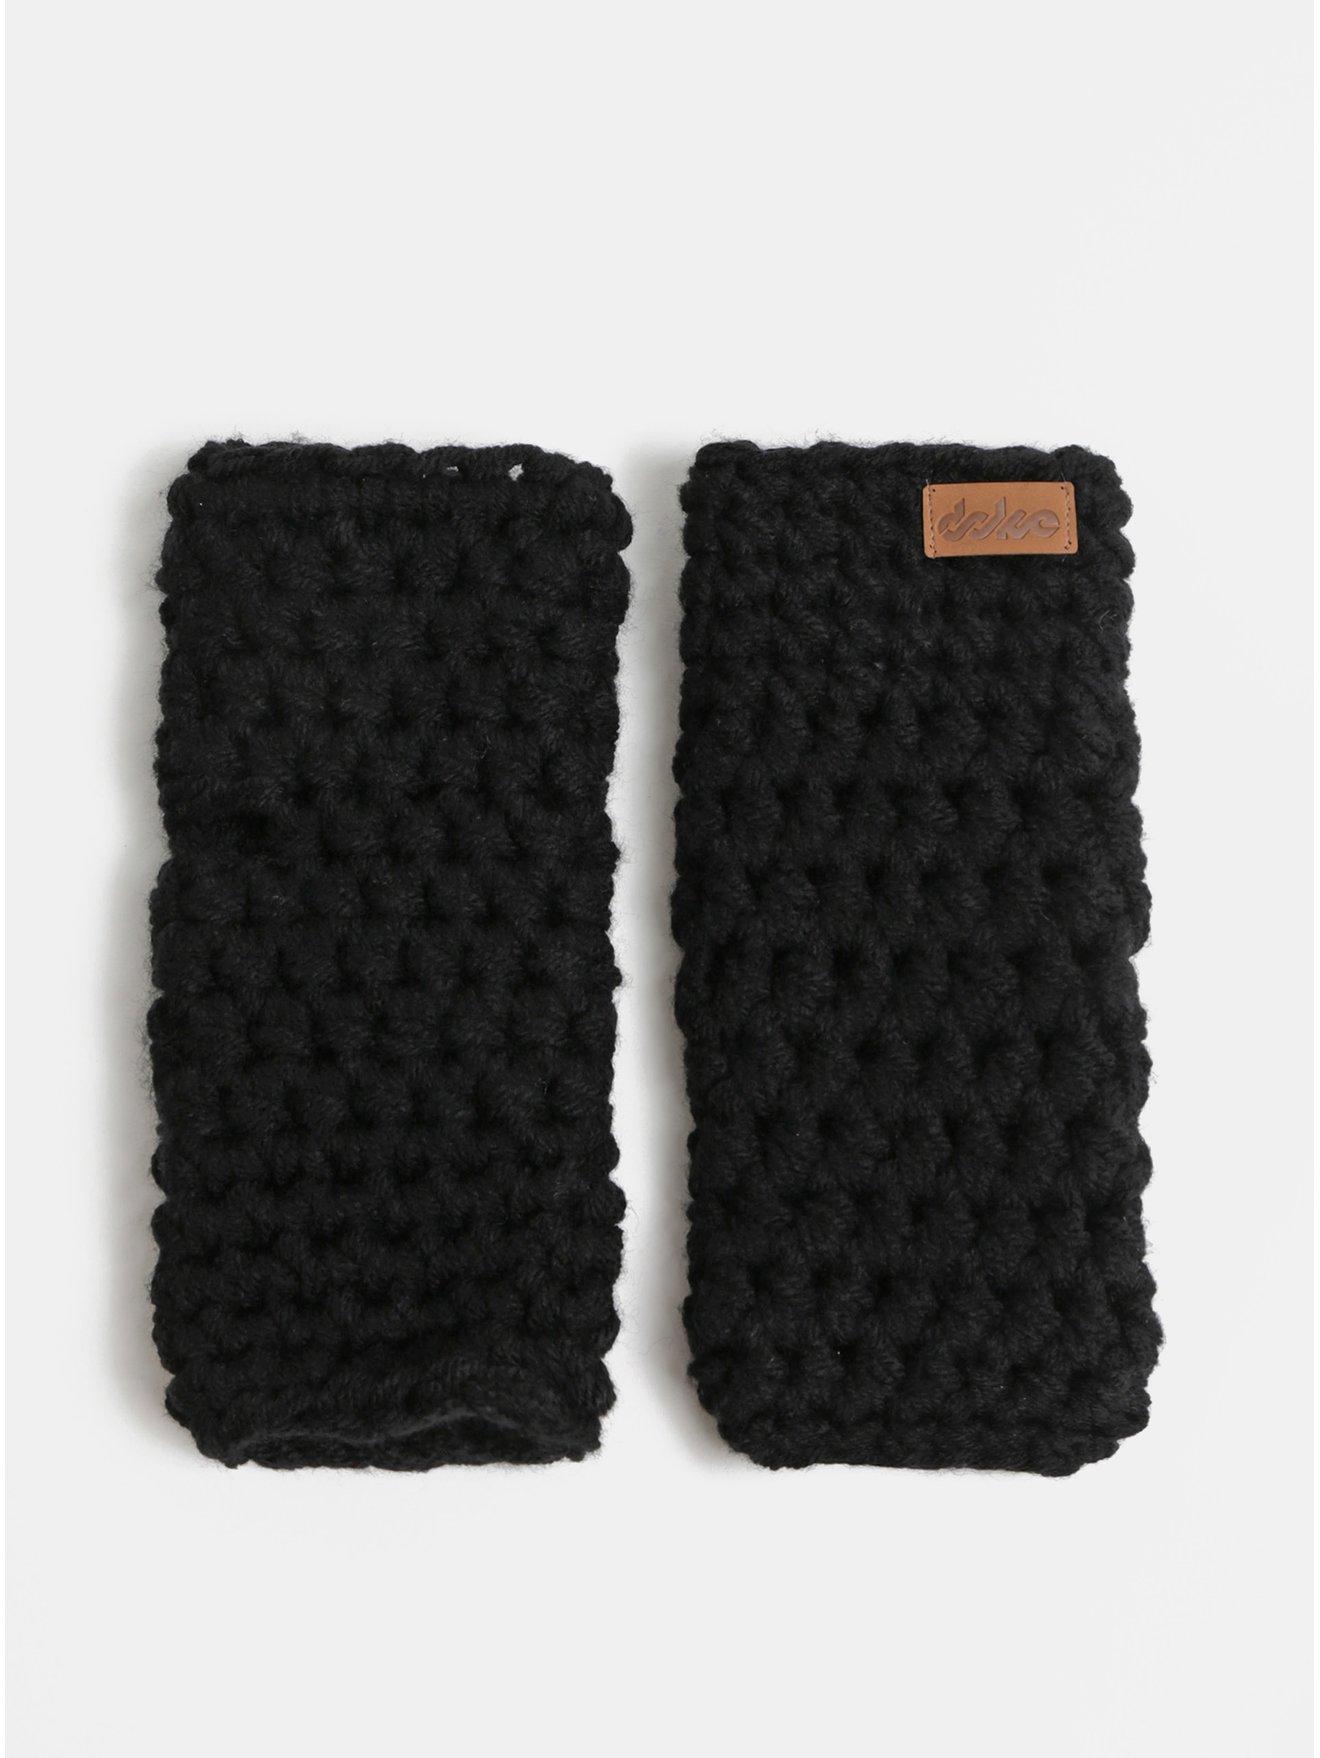 Čierne pletené návleky na ruky DOKE